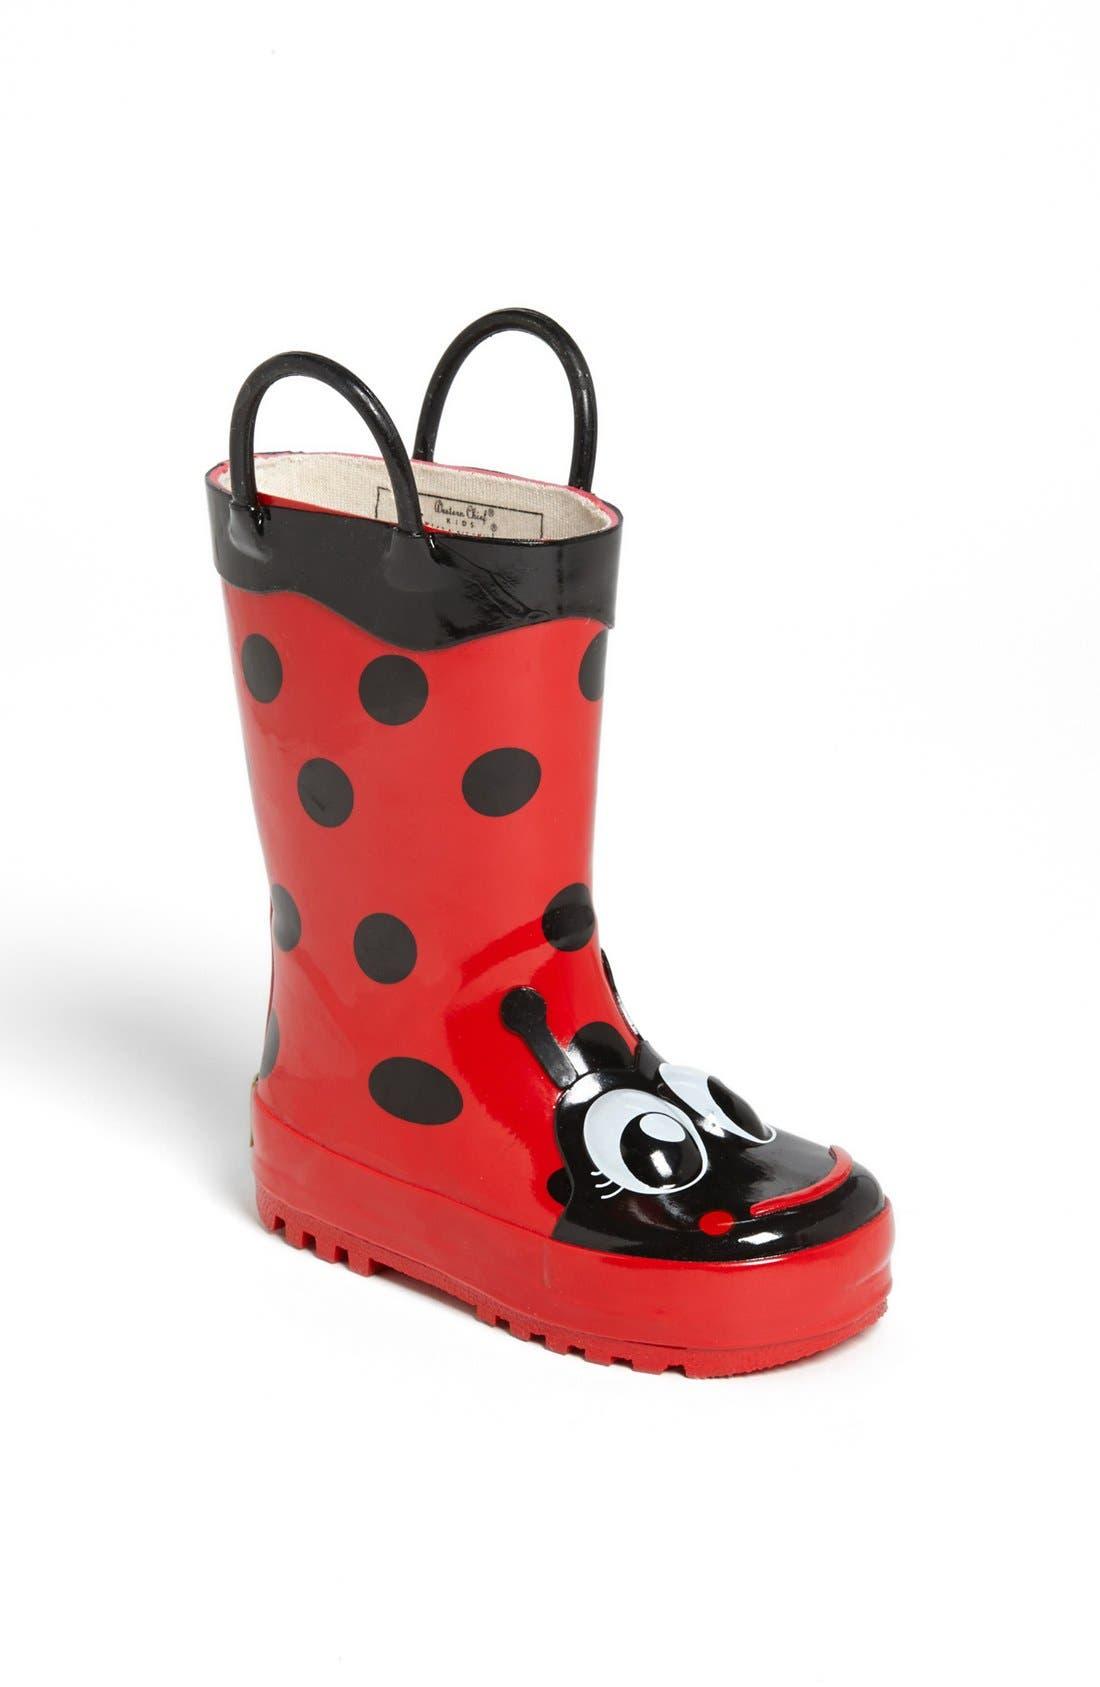 Ladybug Waterproof Rain Boot,                             Main thumbnail 1, color,                             RED